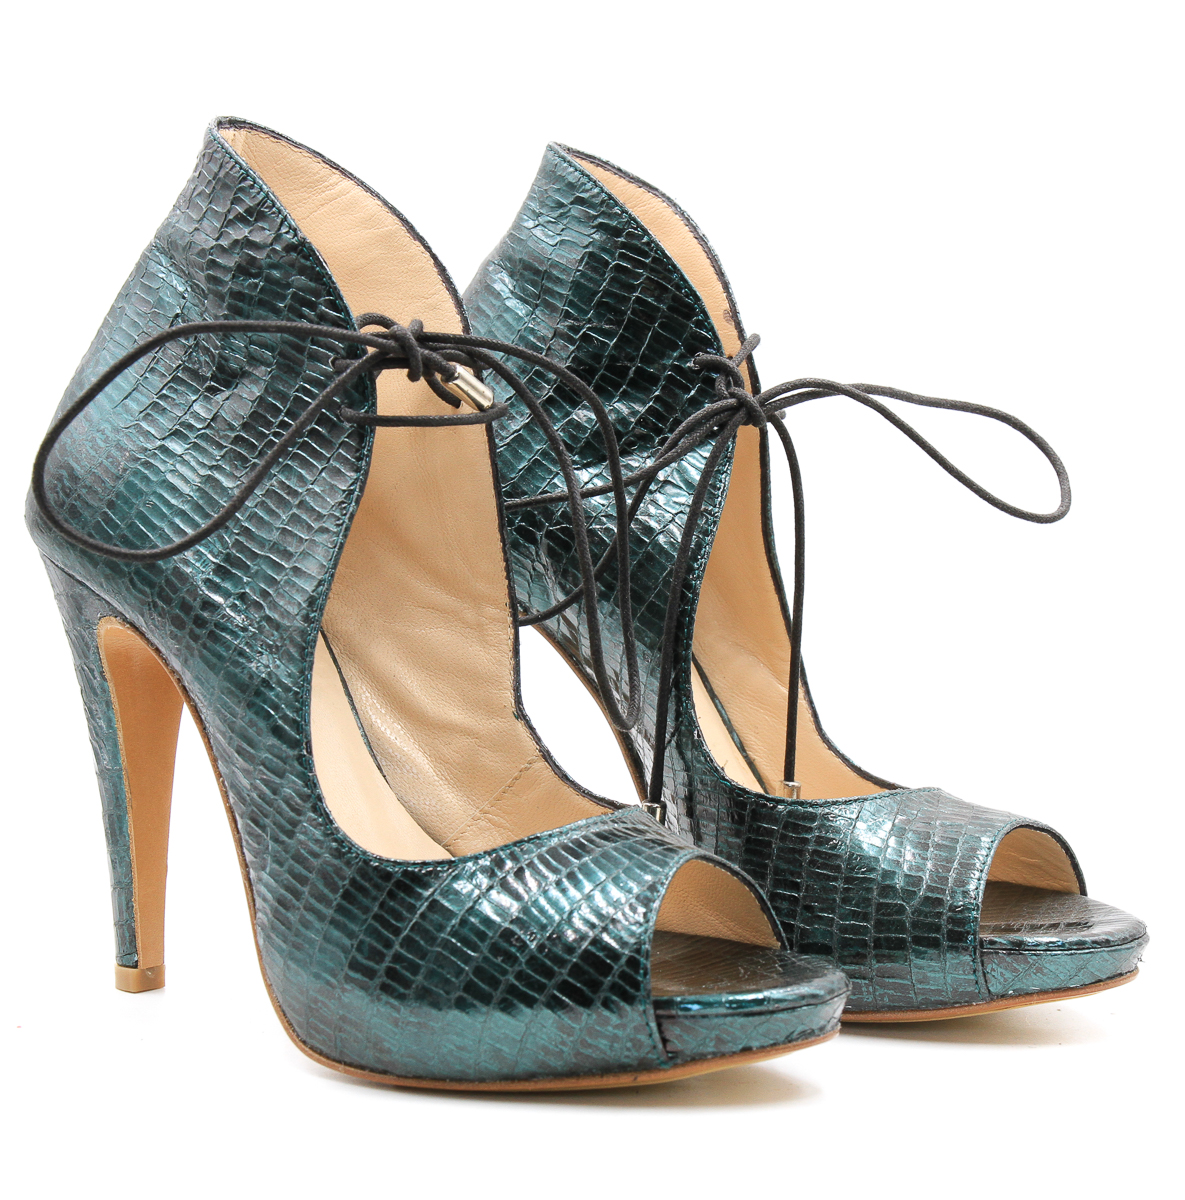 vendita calzature made in italy